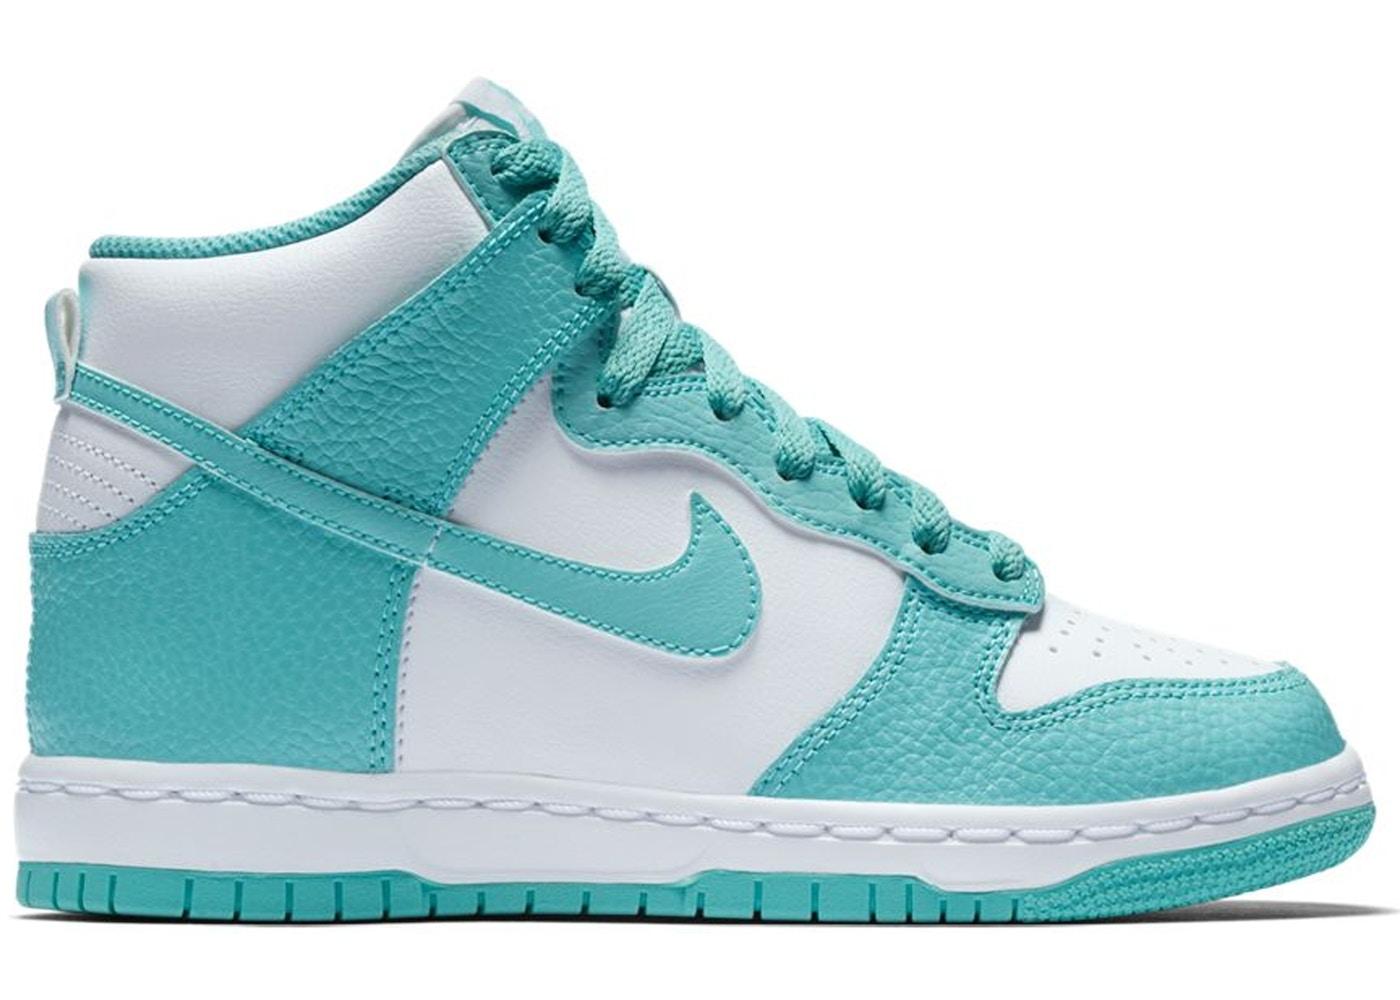 promo code c2a00 cd7f3 Nike Dunk High Island Green (GS) - 921797-300